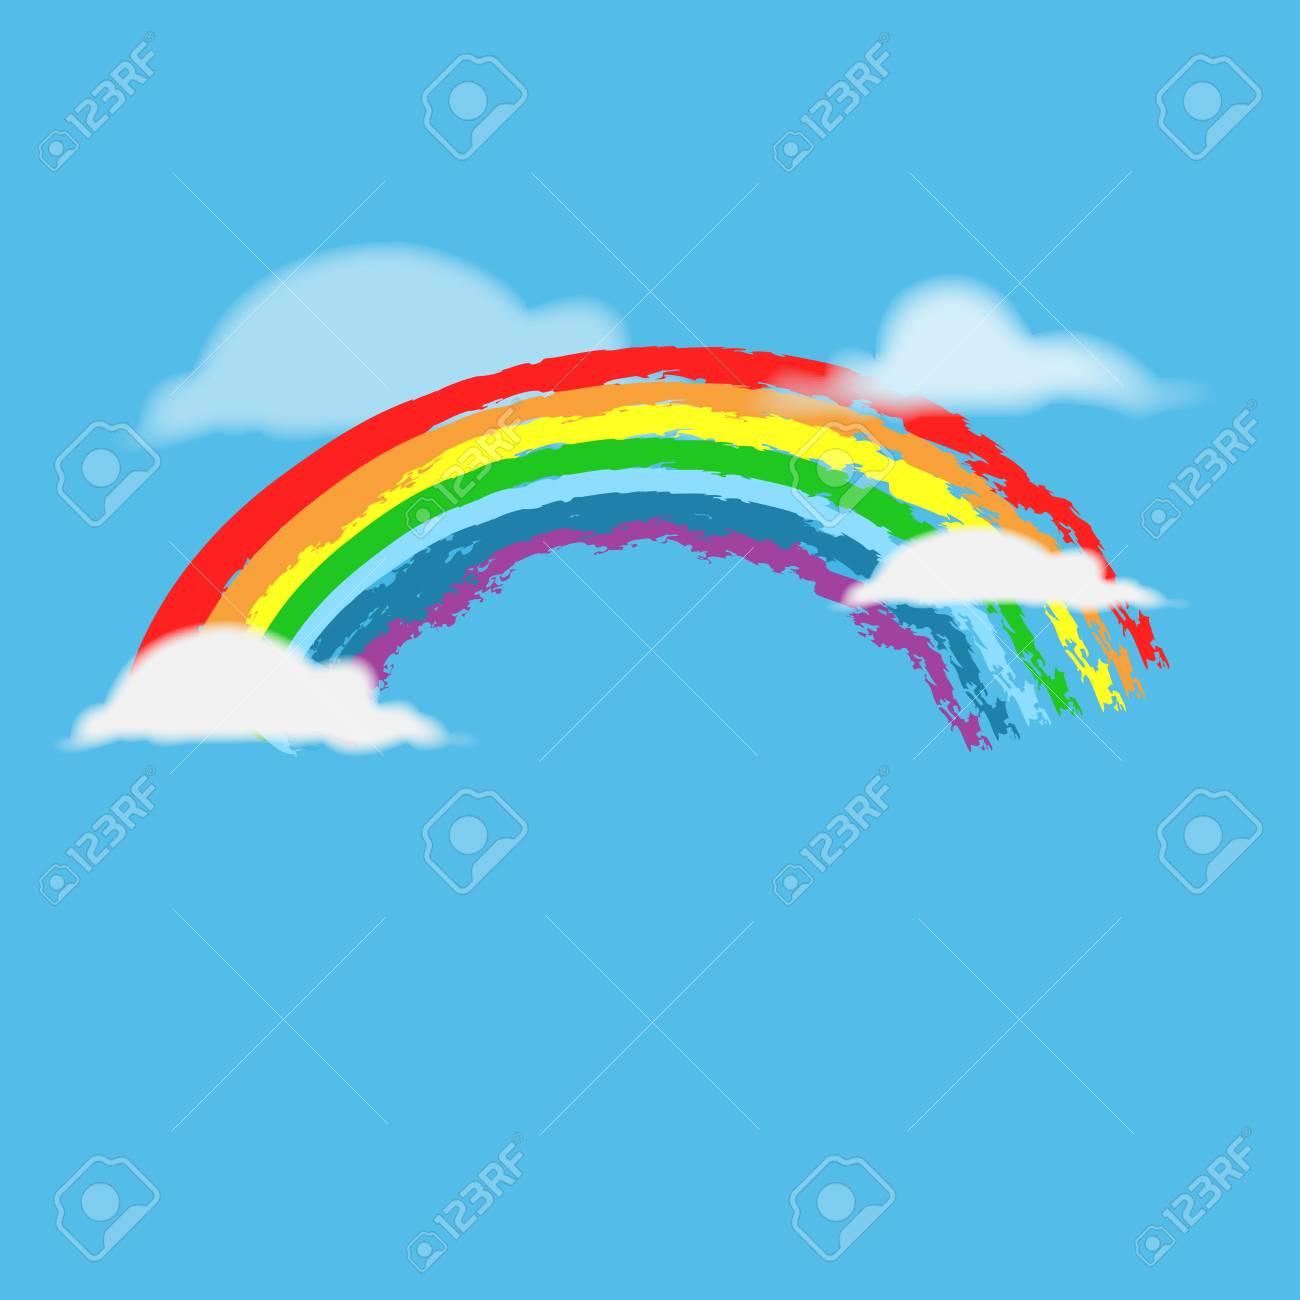 rainbow on sky sign. illustration colorful spectrum arc. cute